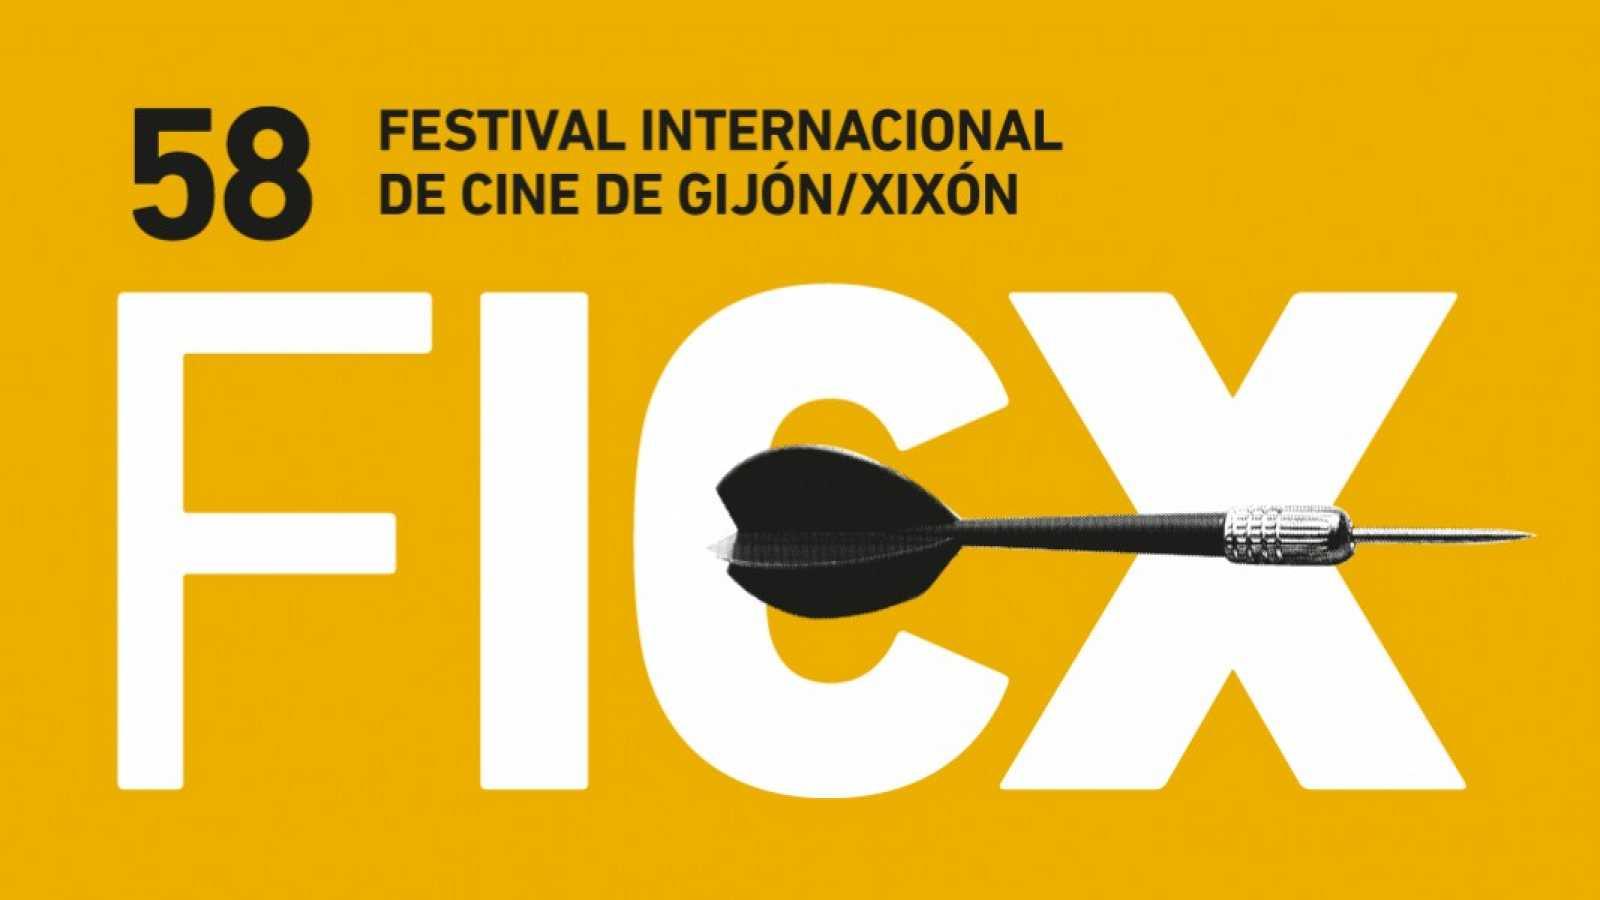 58 Festival Internacional de Cine de Gijón